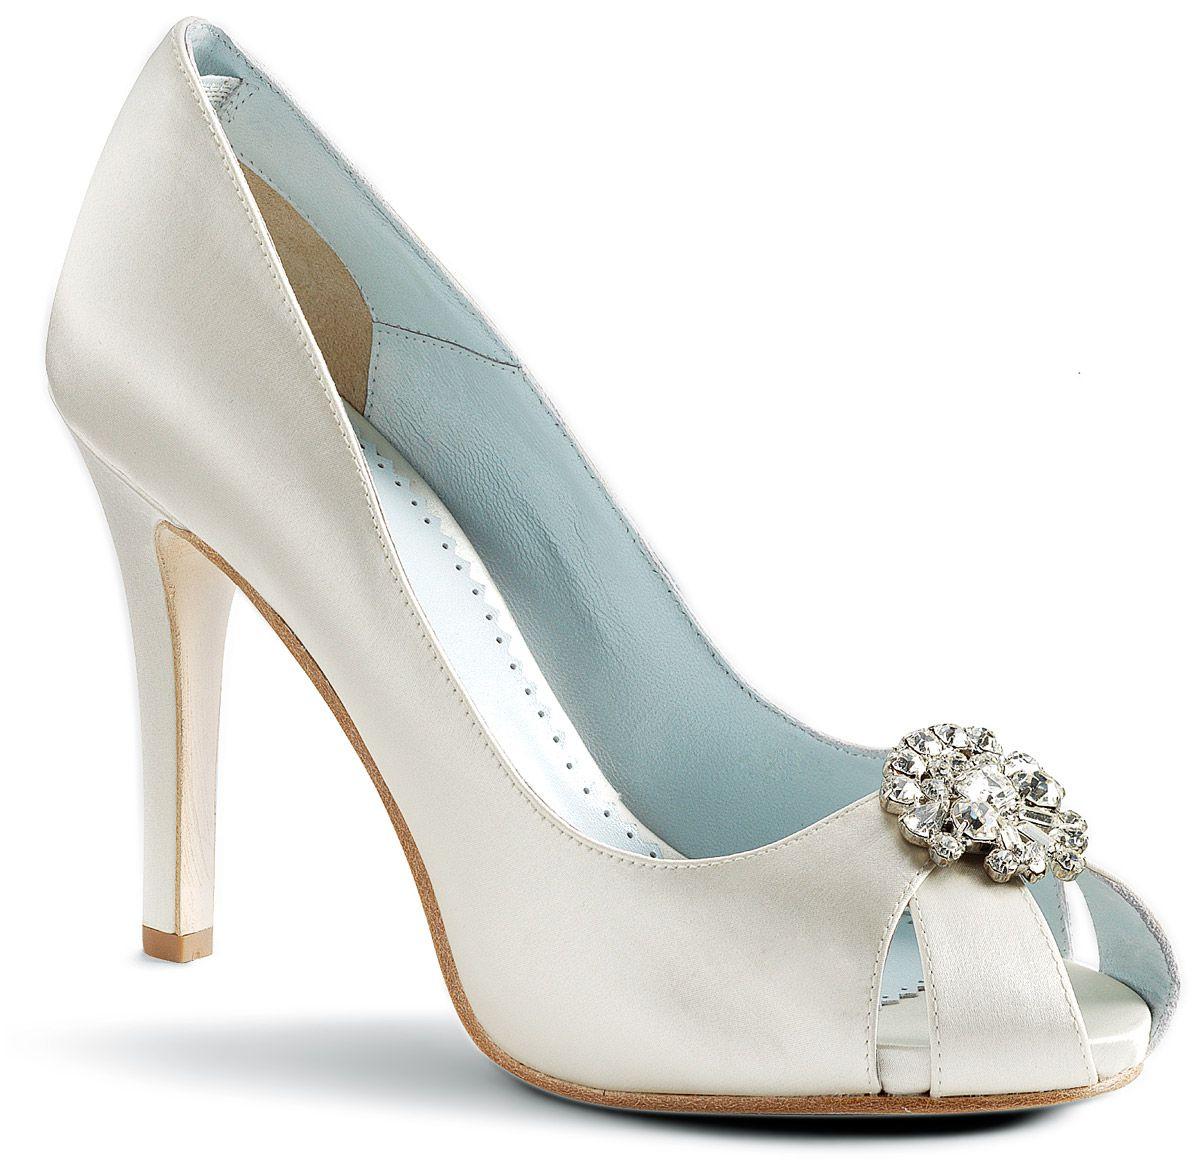 34 best Ivory Bridal Shoes images on Pinterest | Bridal shoes, Bride ...